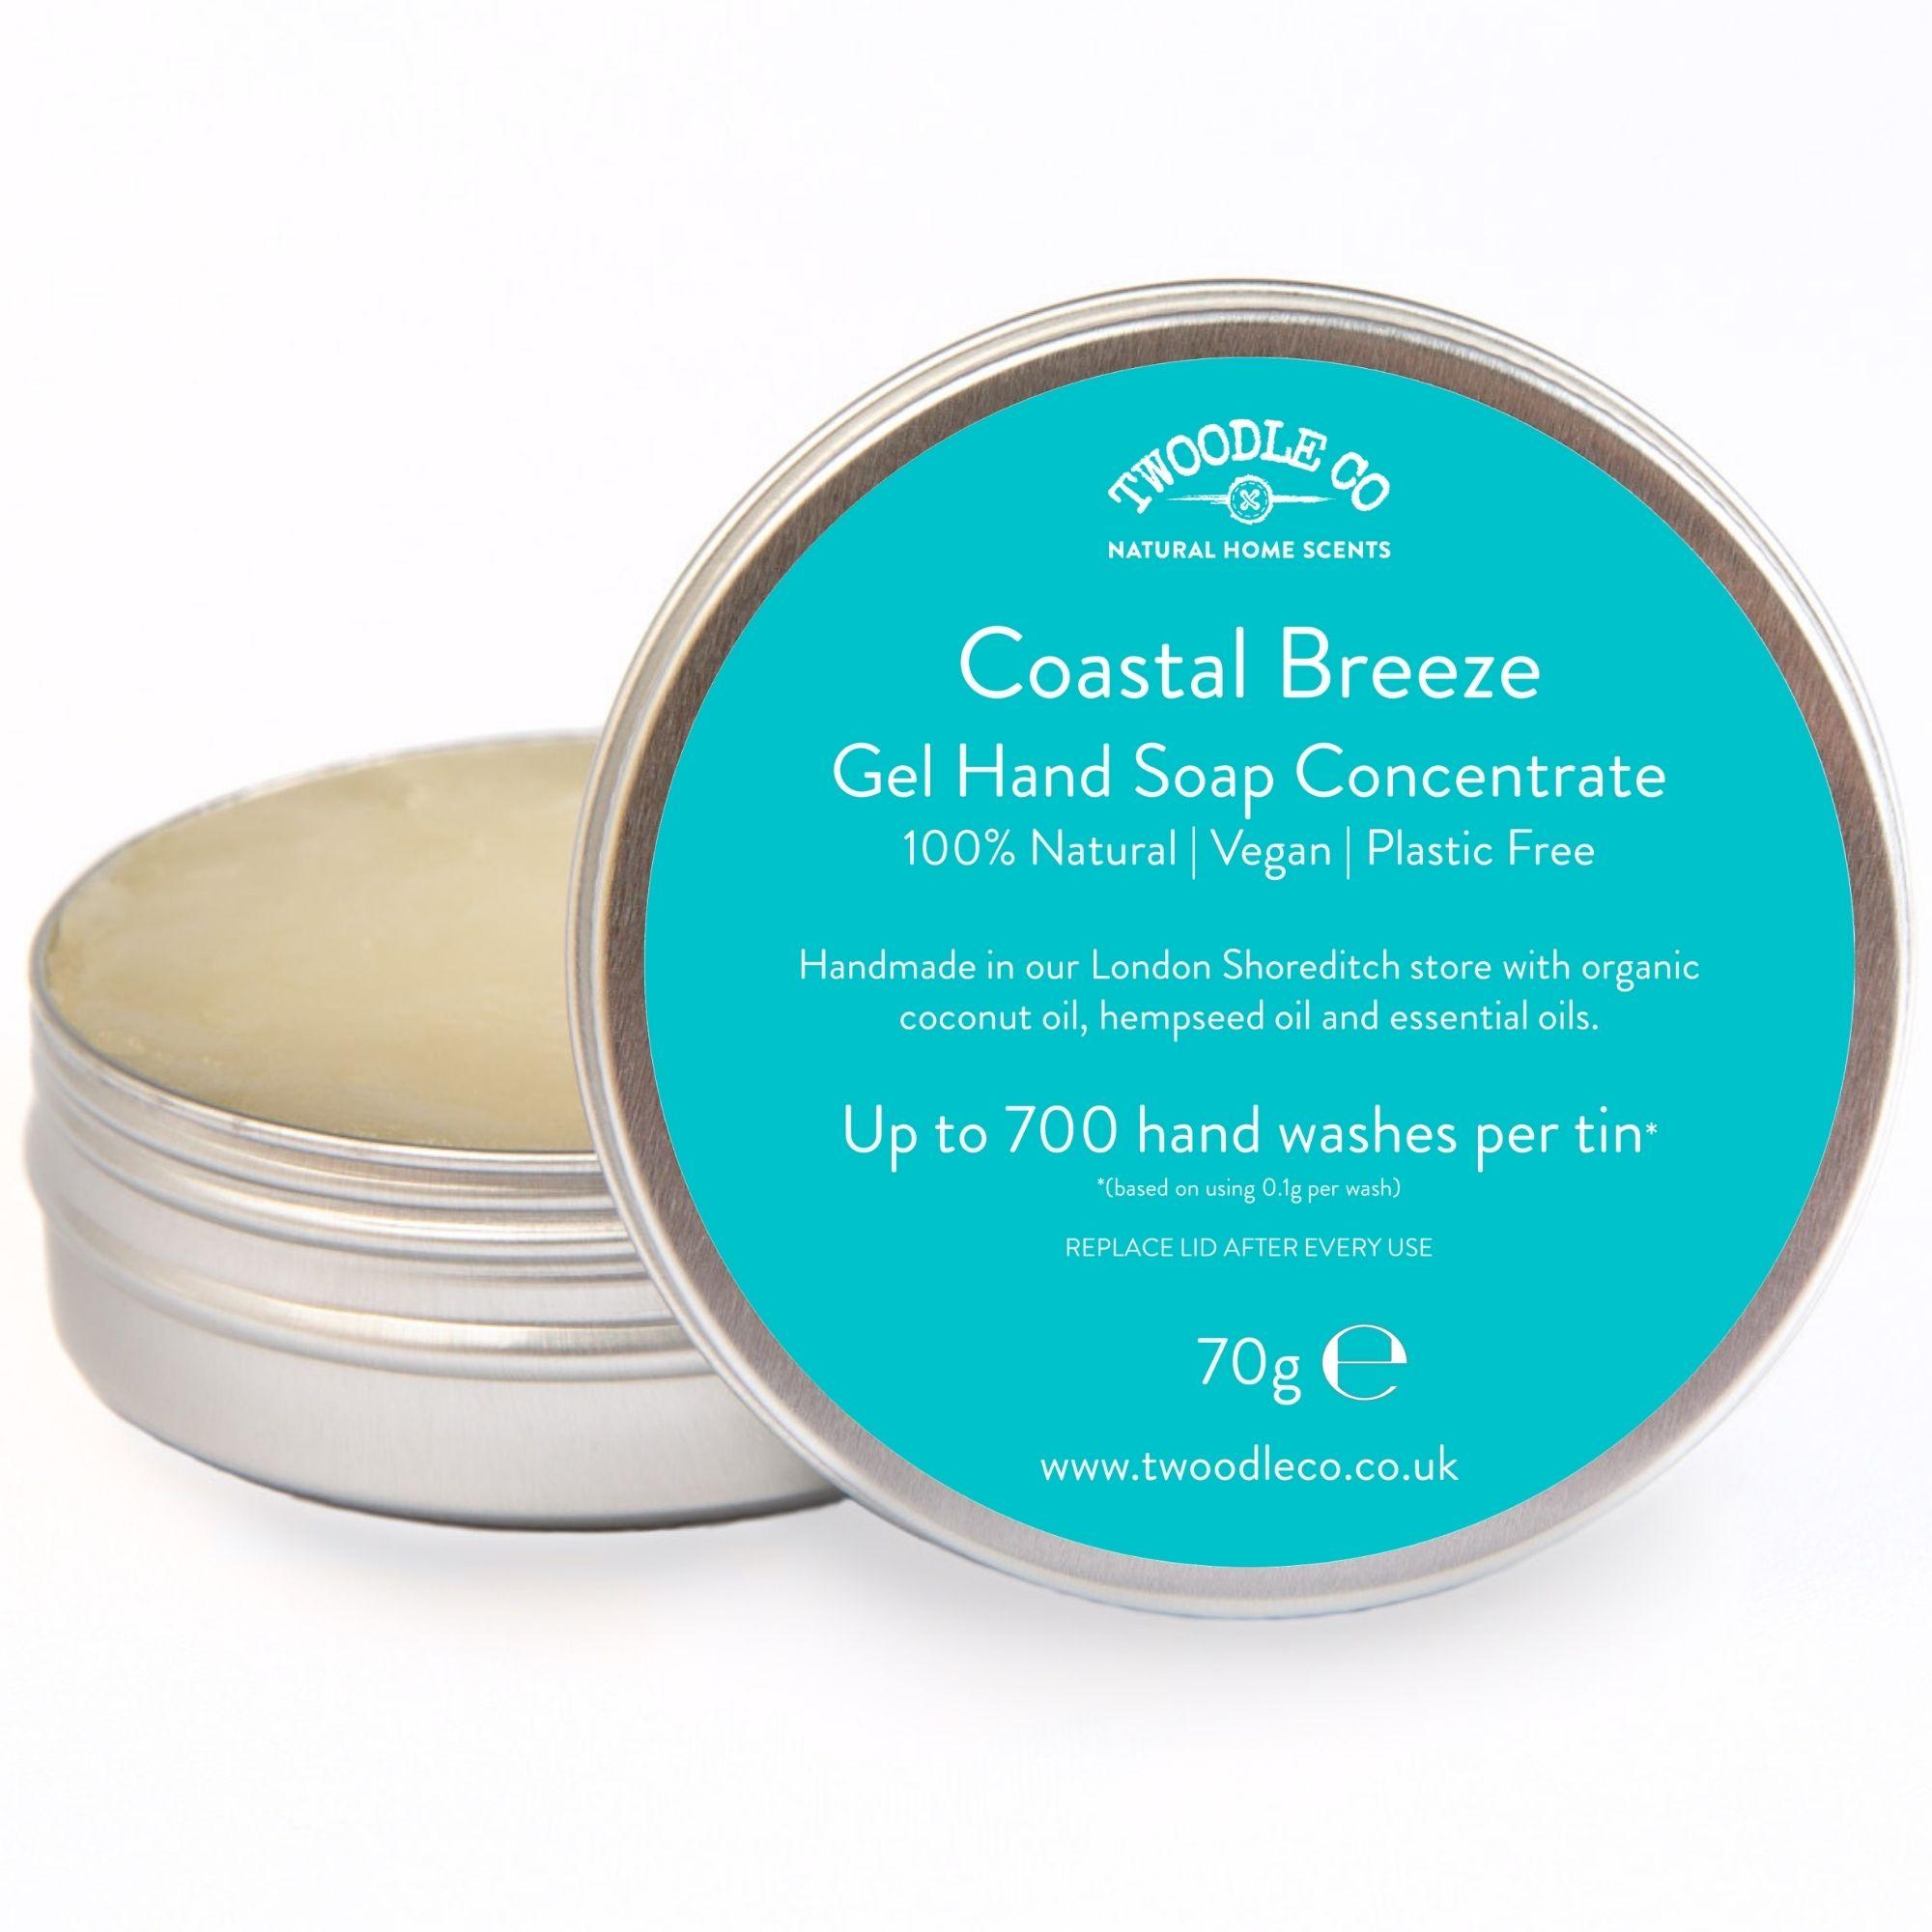 Coastal Breeze Gel Hand Soap Concentrate